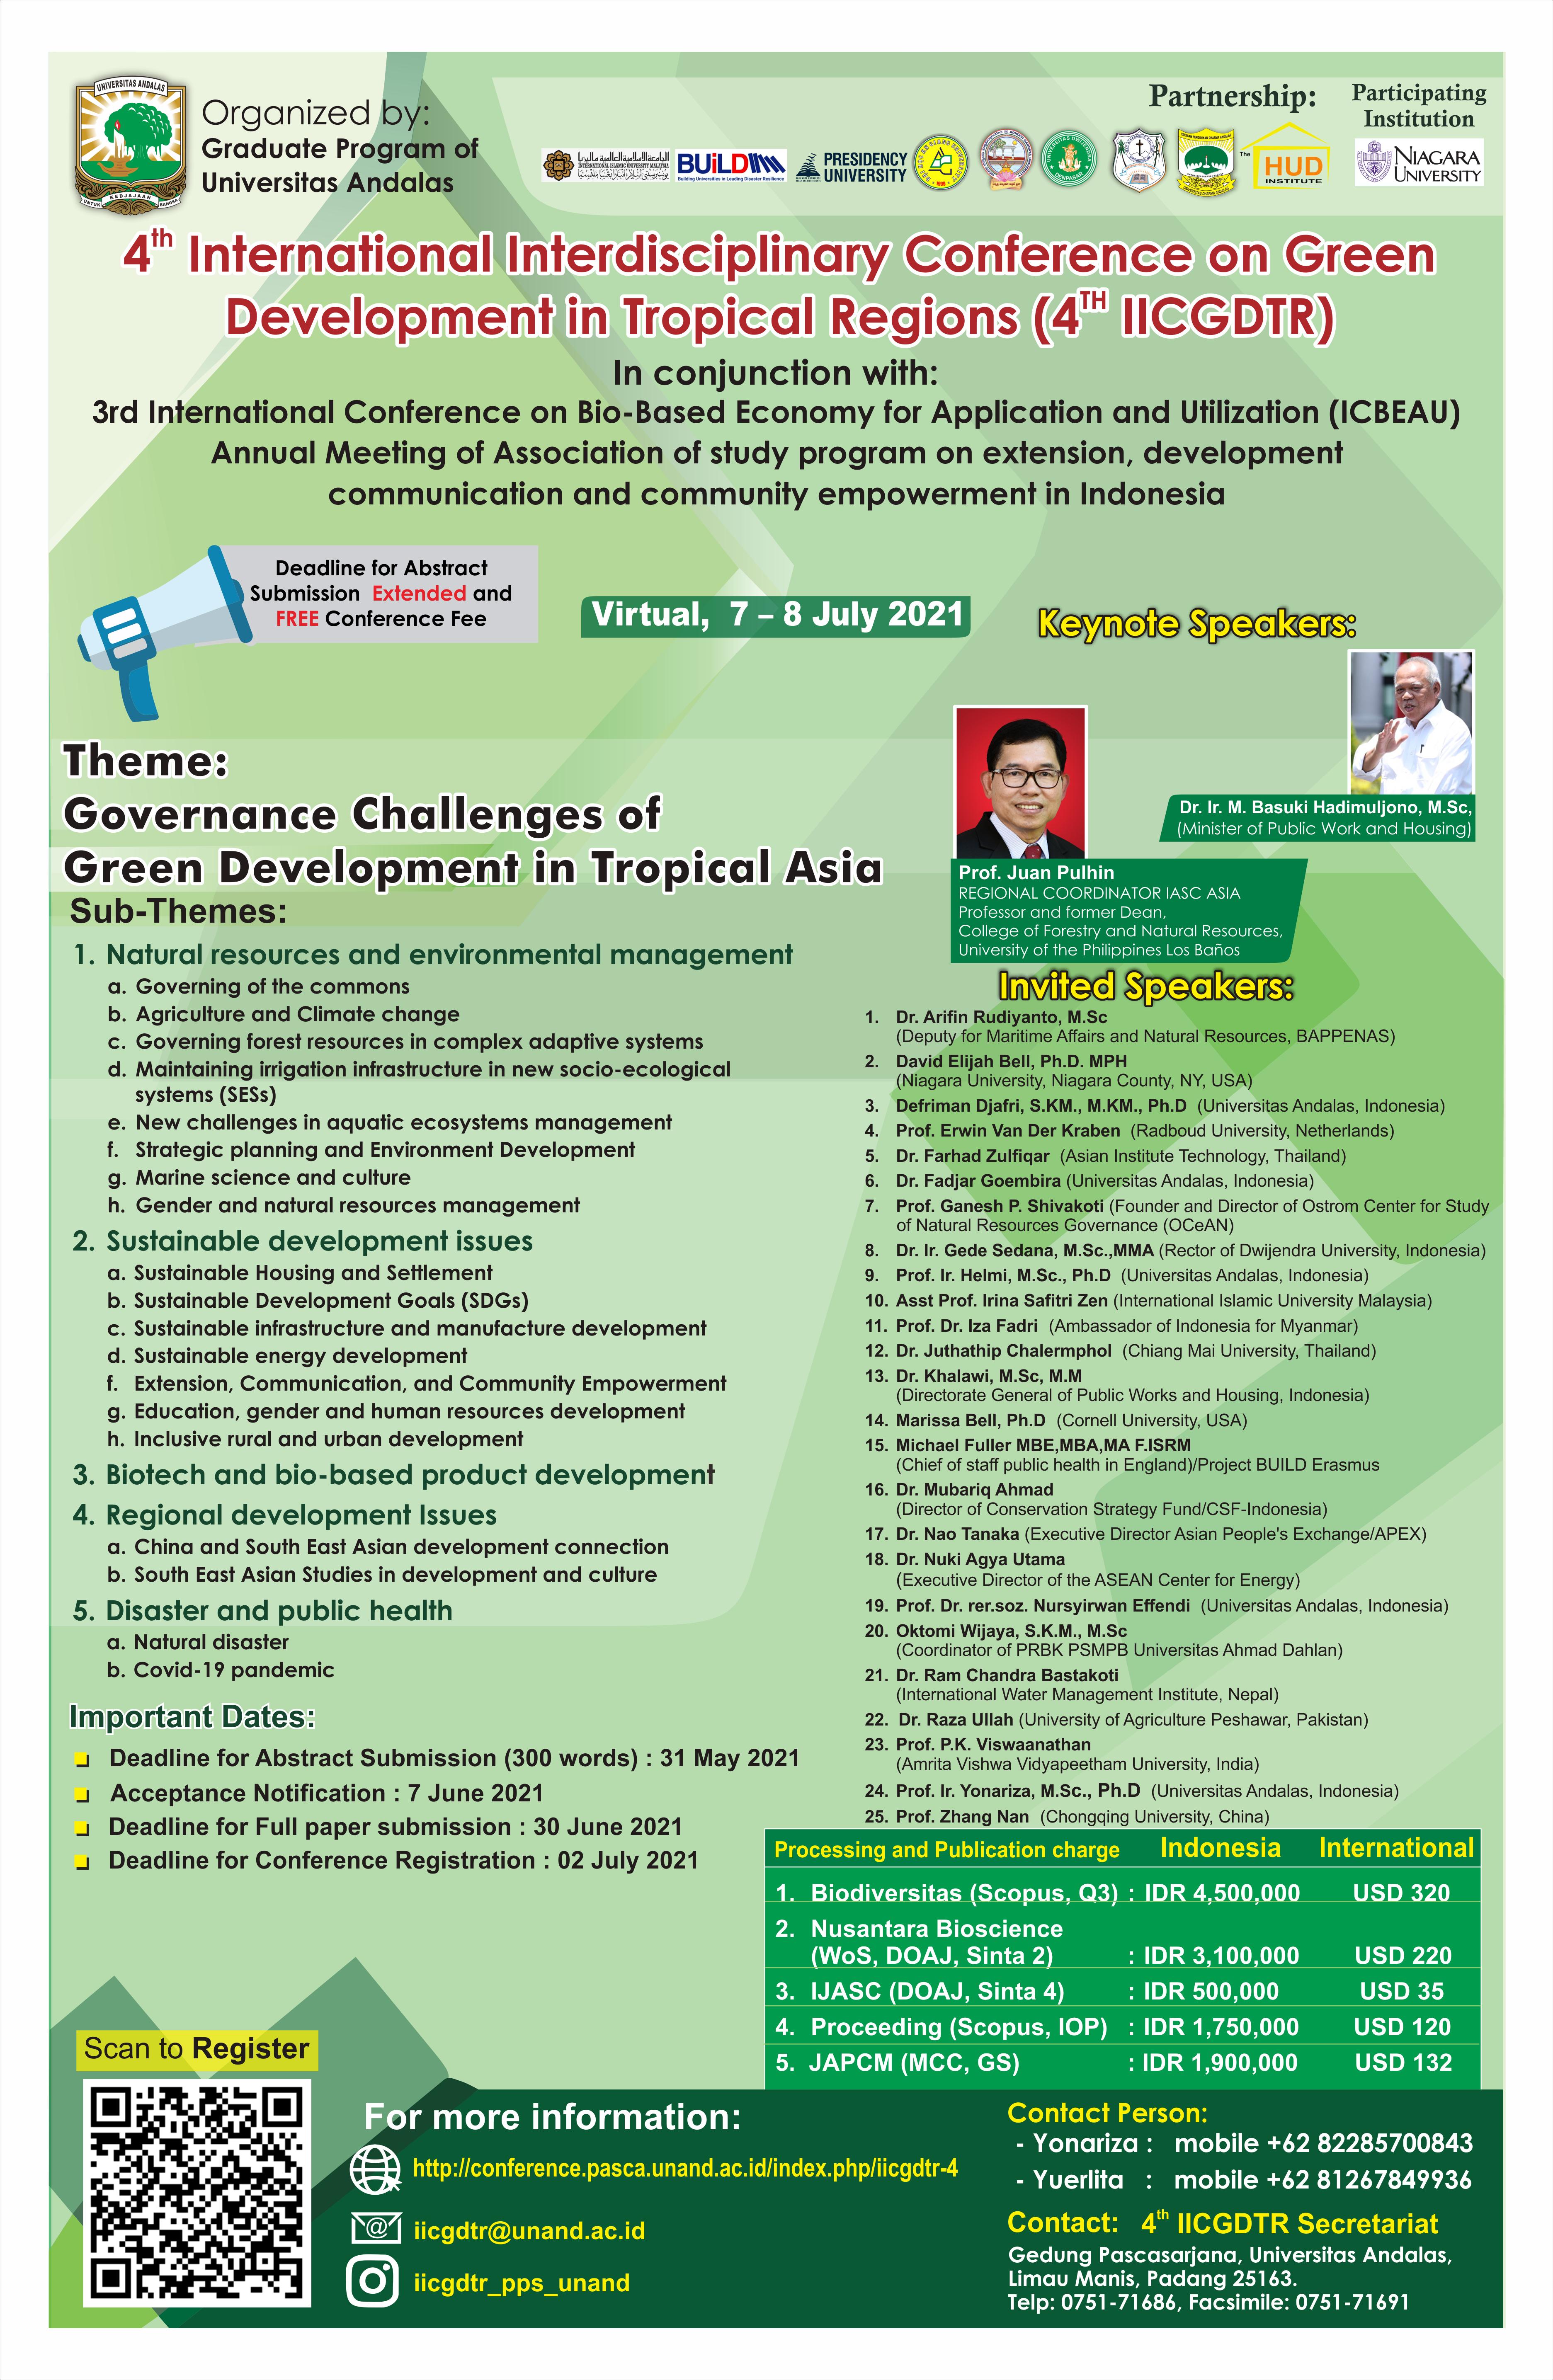 4th International Interdisciplinary Conference on Green Development in Tropical Regions (4th IICGDTR)